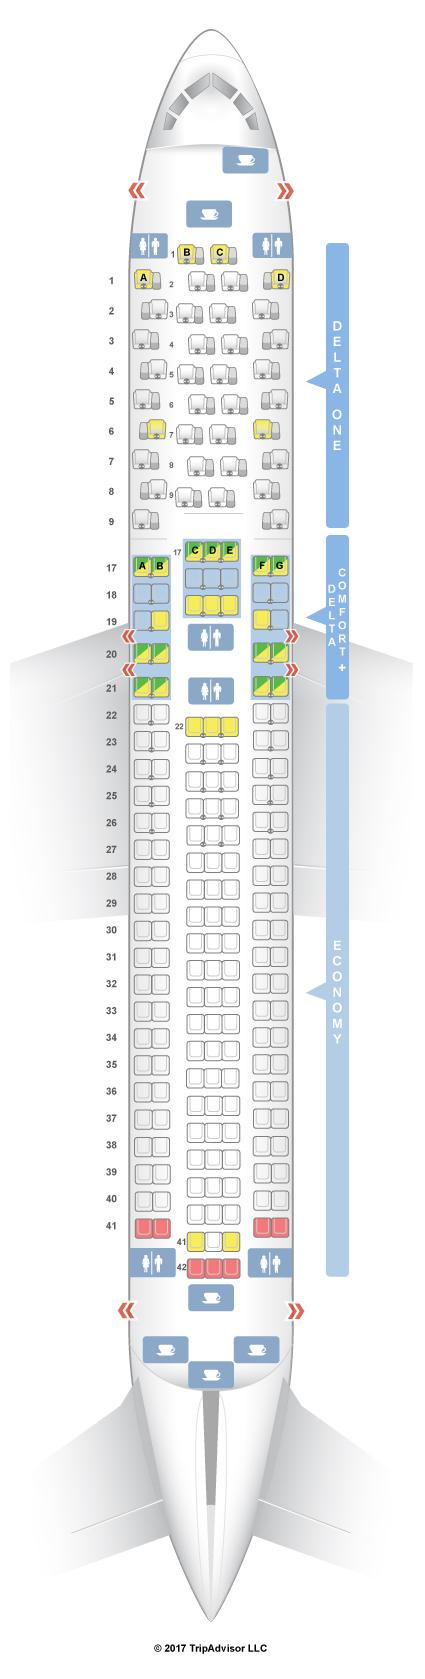 delta md 80 seating chart - Timiznceptzmusic